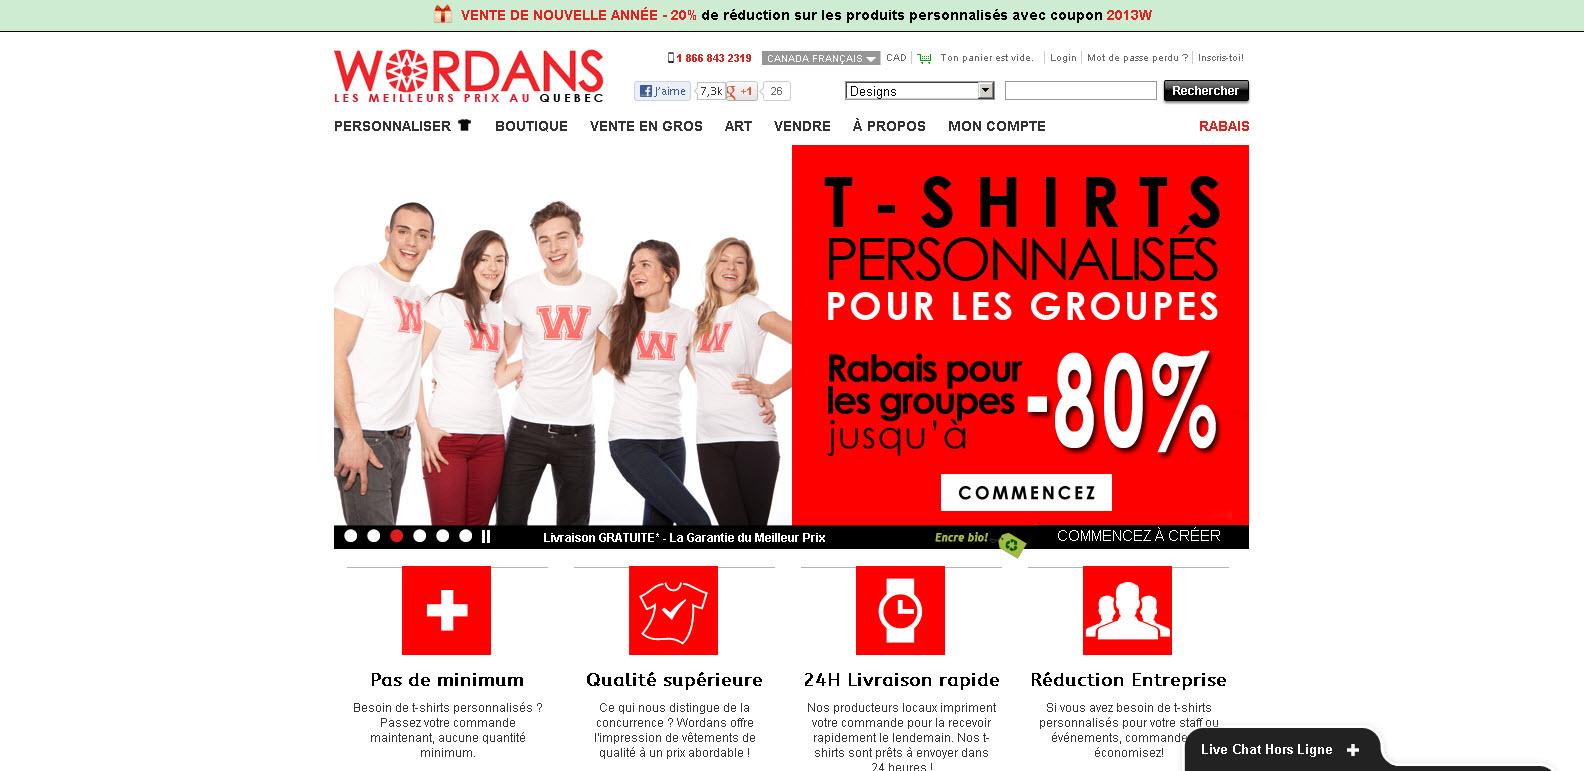 Wordans - T-Shirts